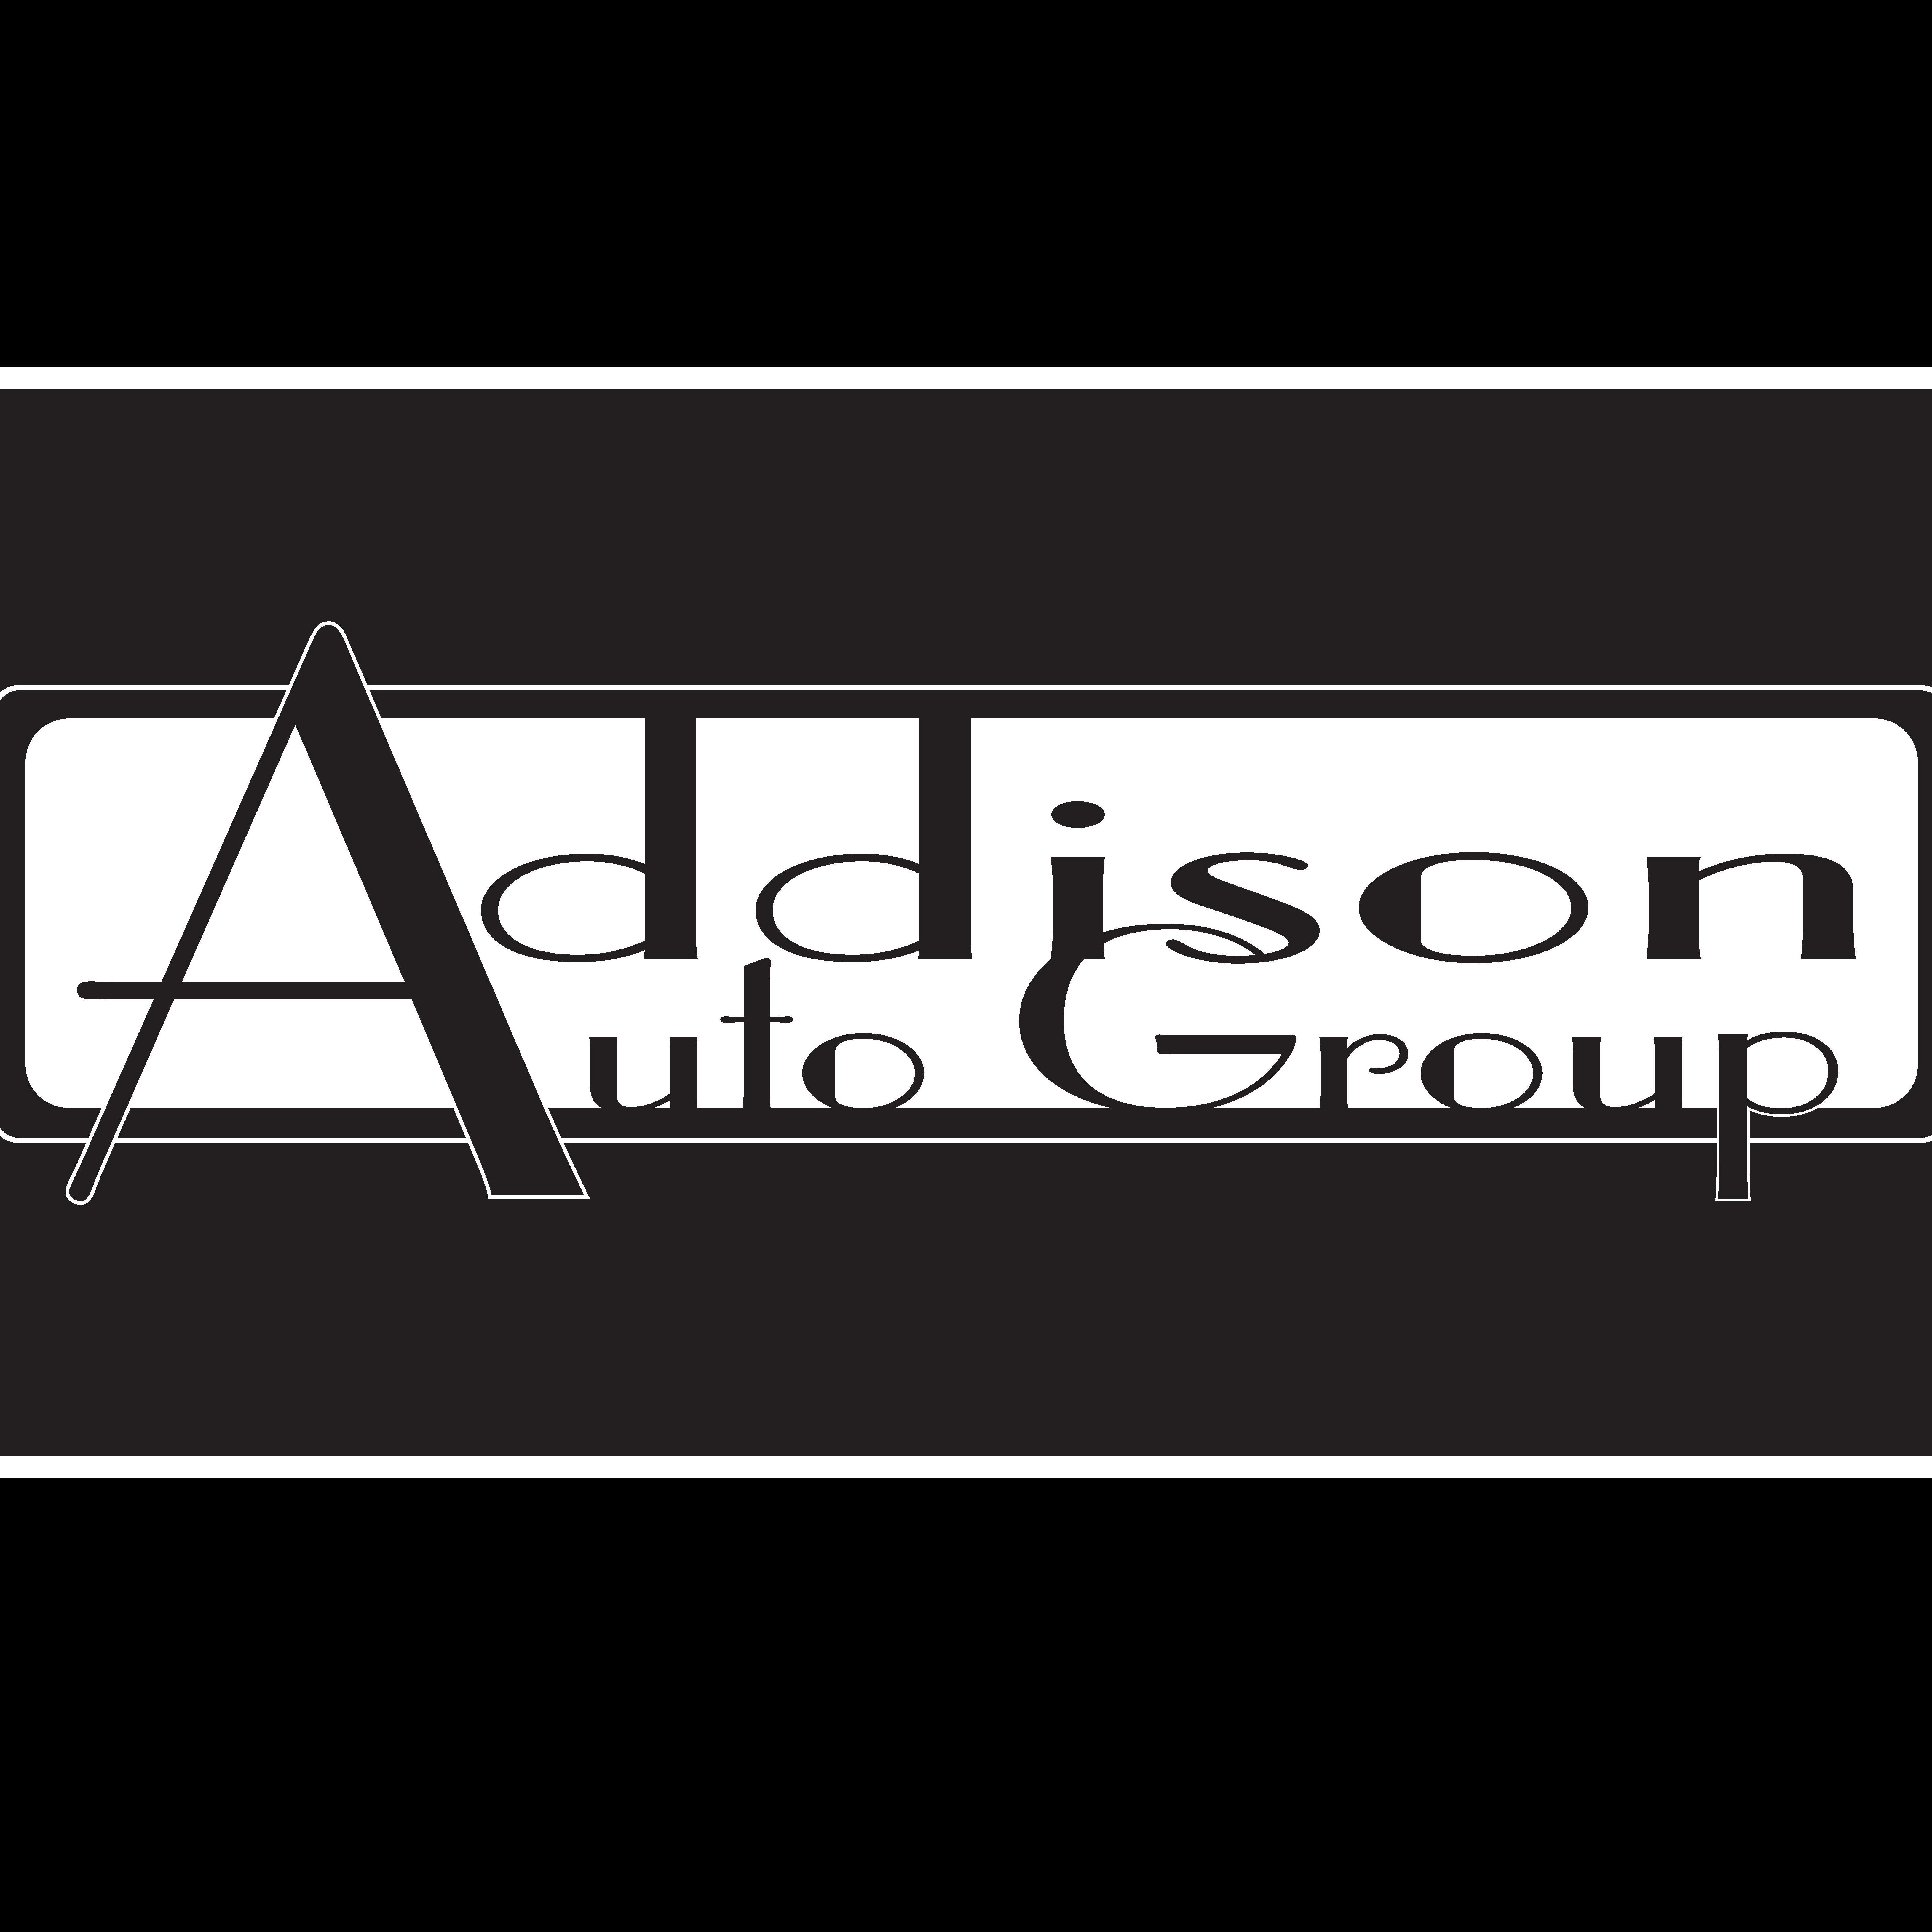 The Addison Auto Group